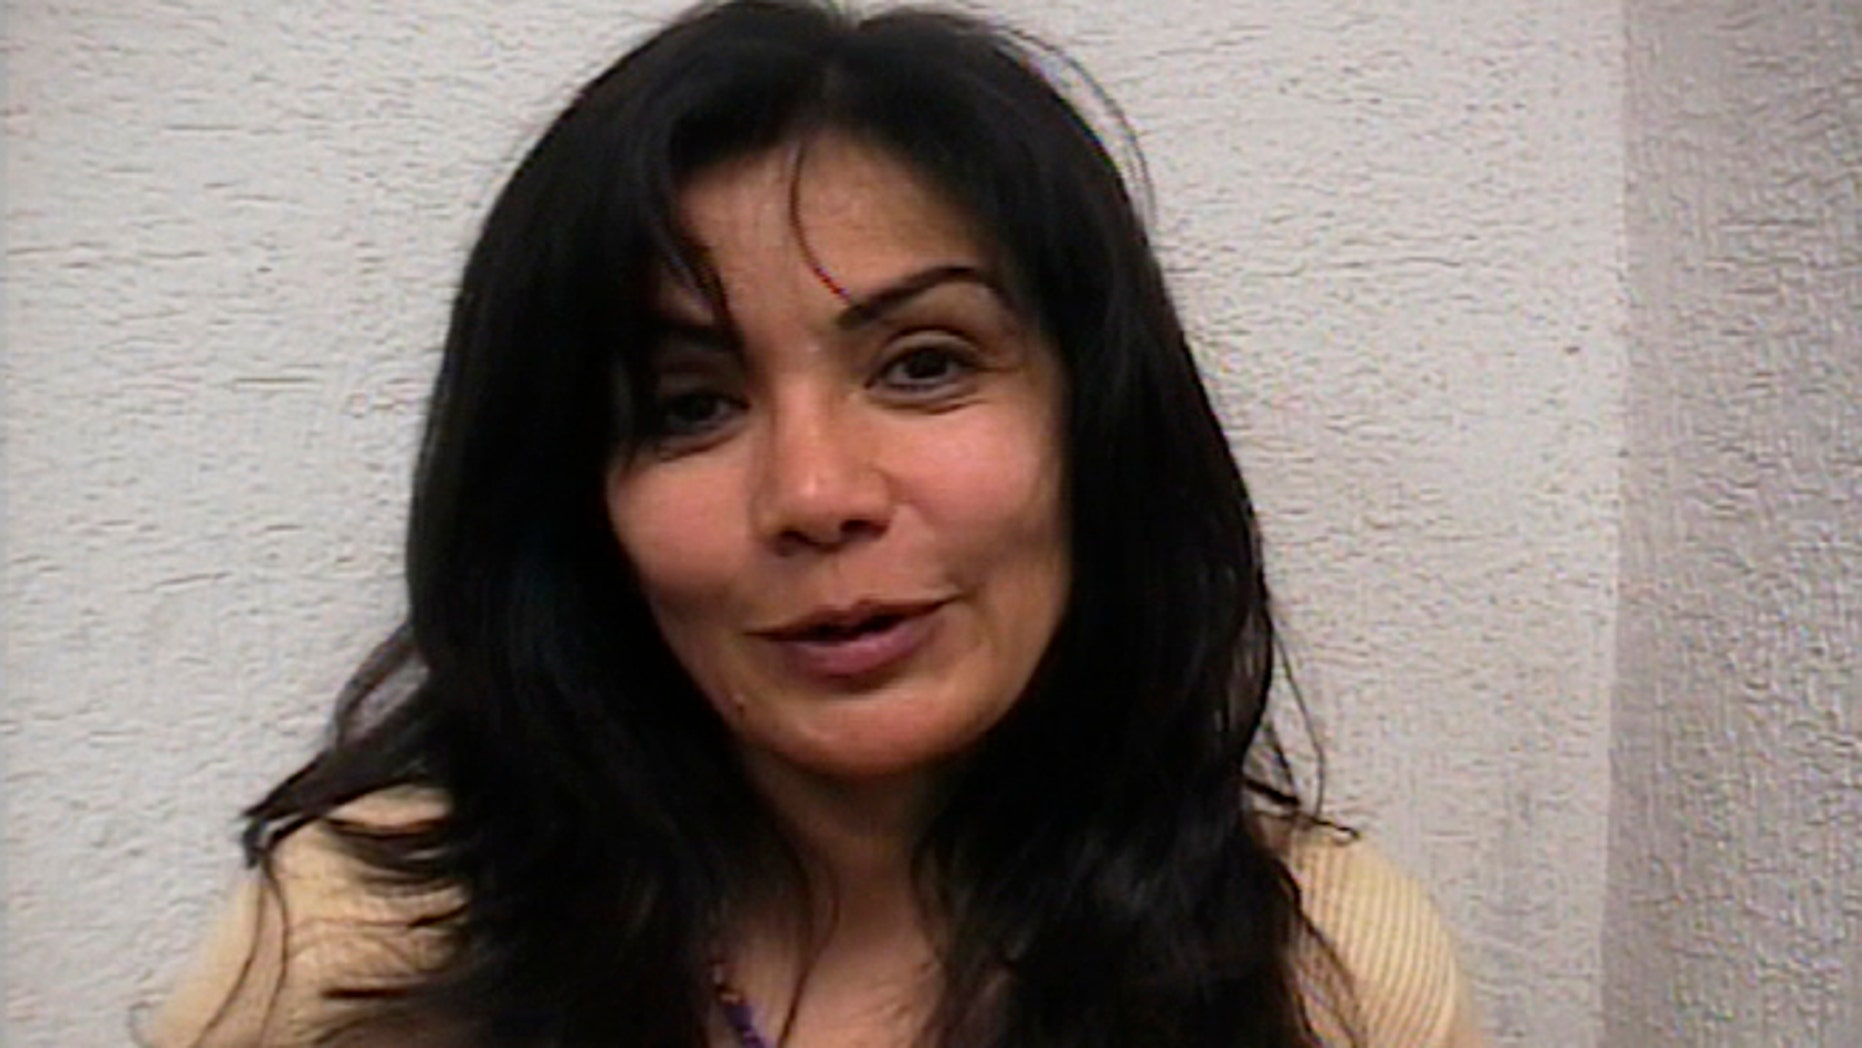 Sandra Avila Beltran, the Queen of the Pacific, after her arrest on Sept. 28, 2007.